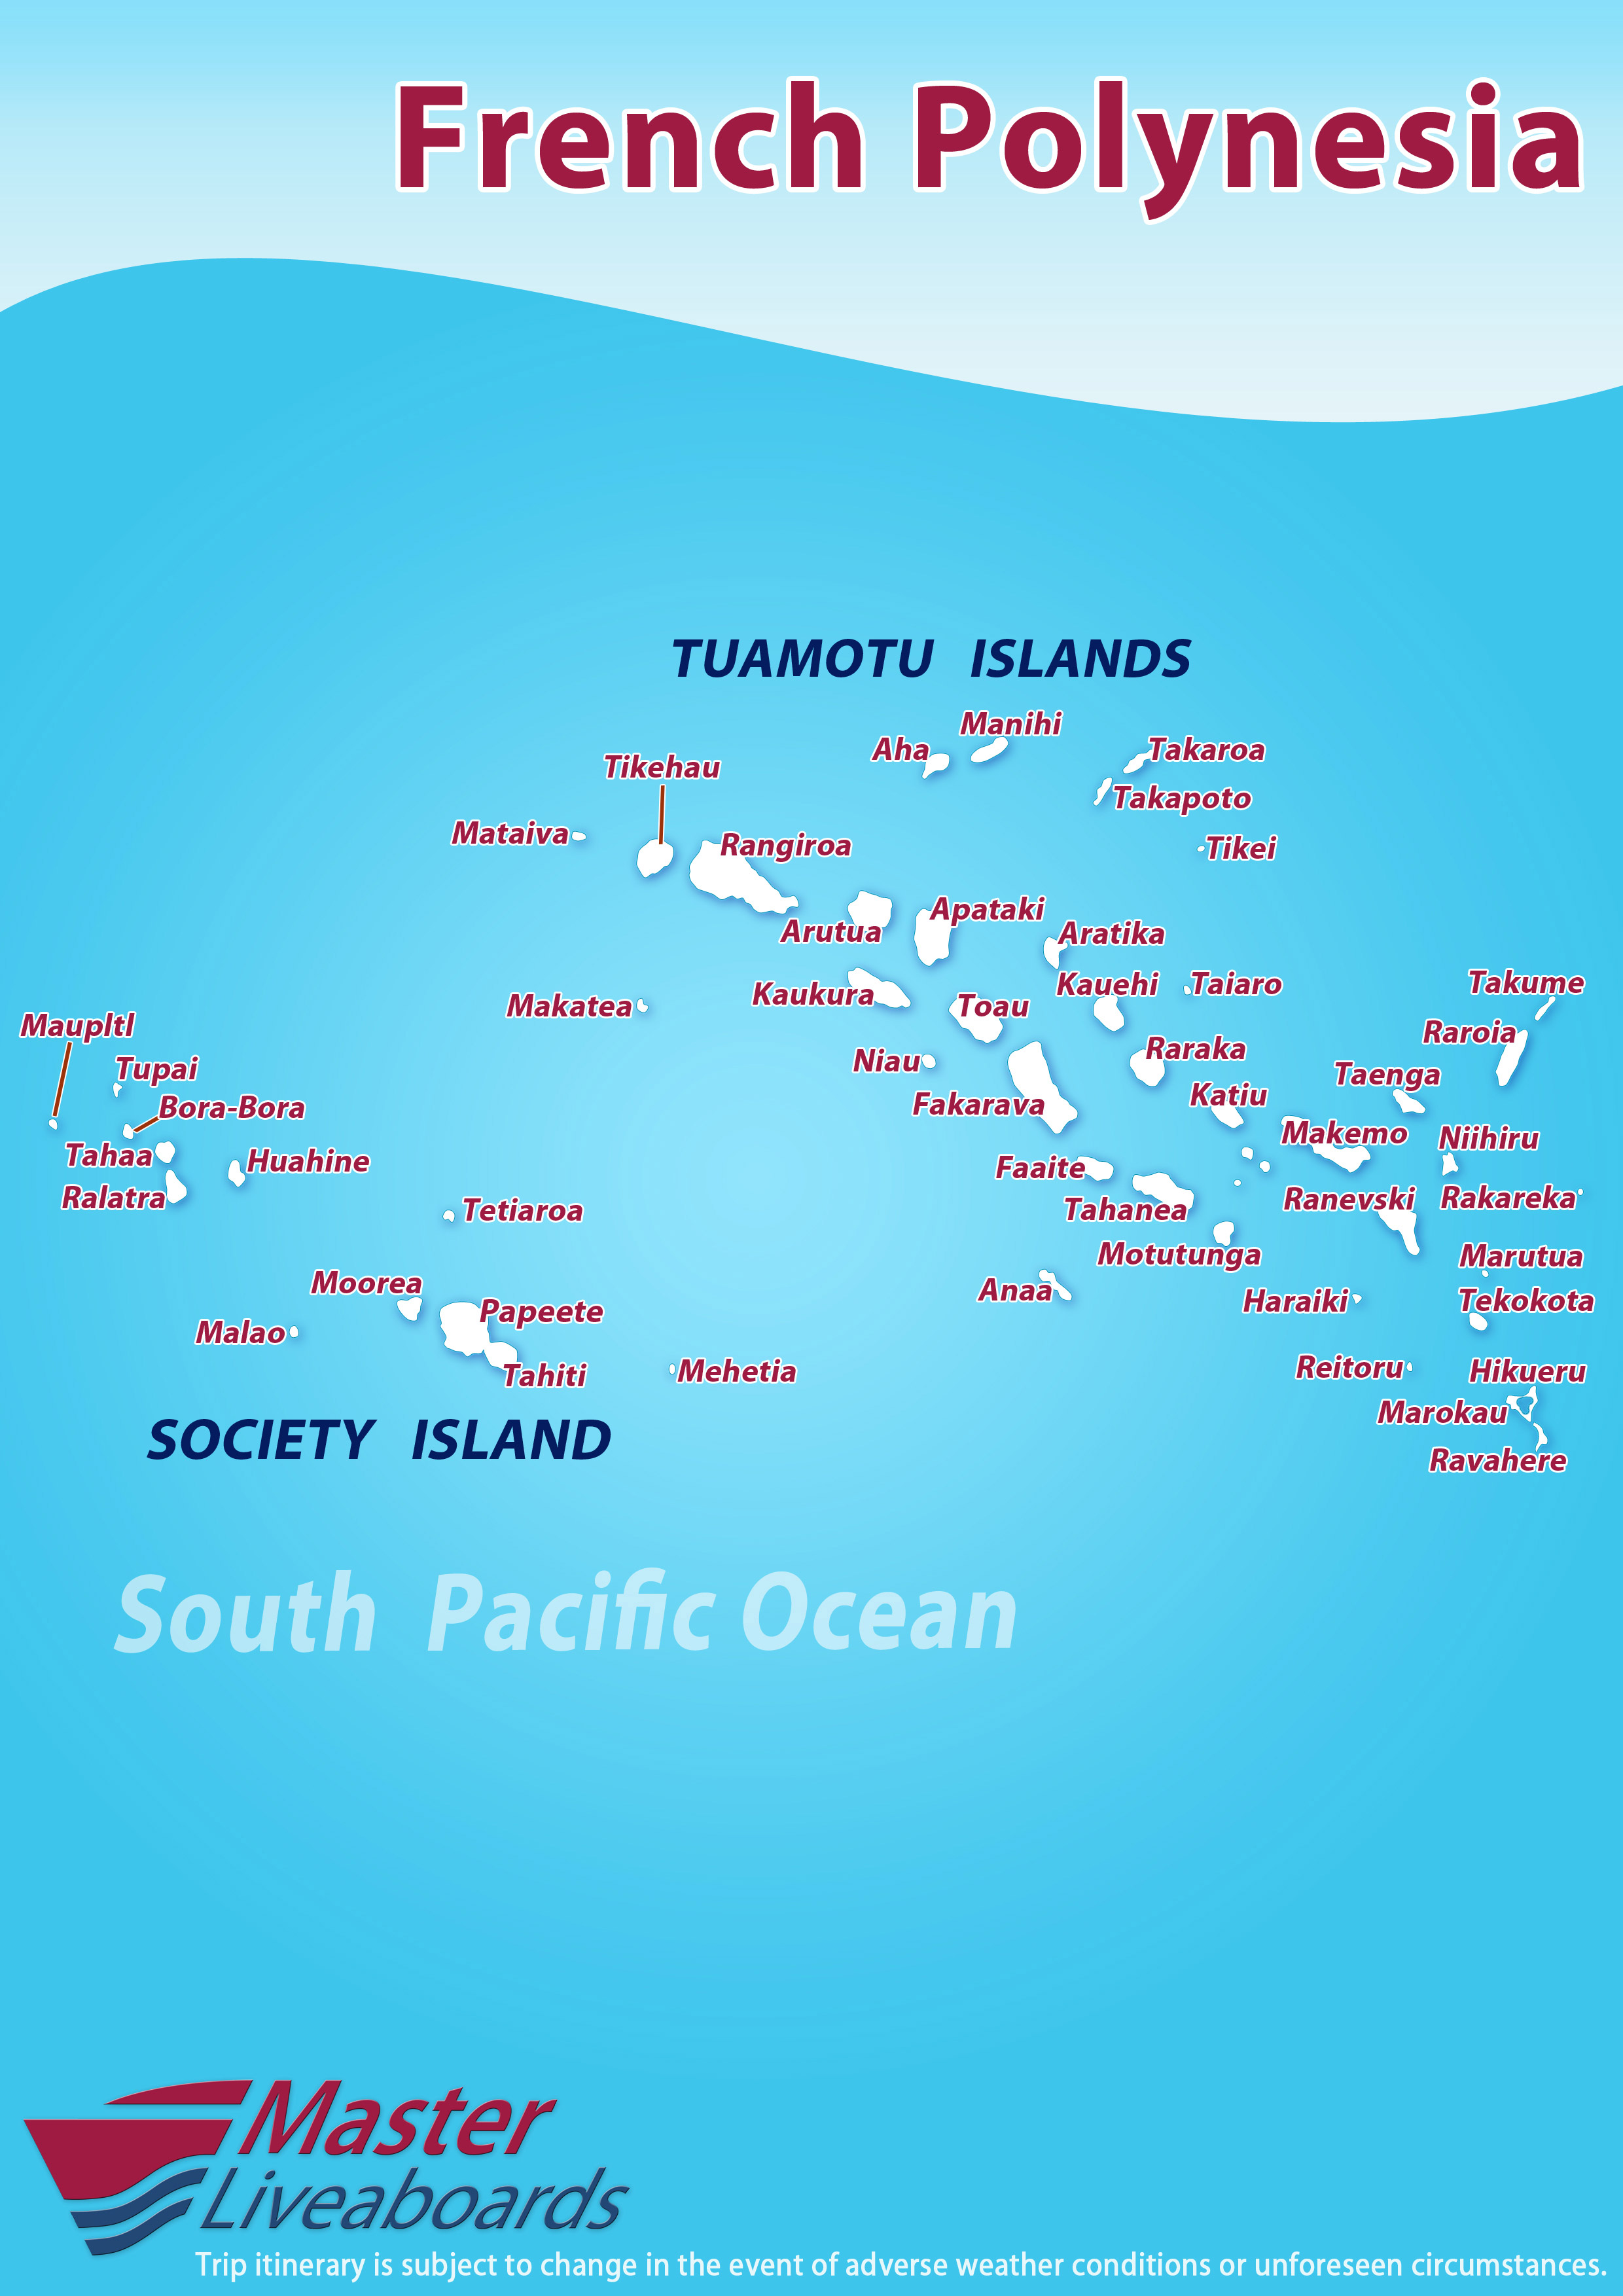 Tuamotu Archipelago, French Polynesia Expedition 2018: Fakarava to Rangiroa atoll